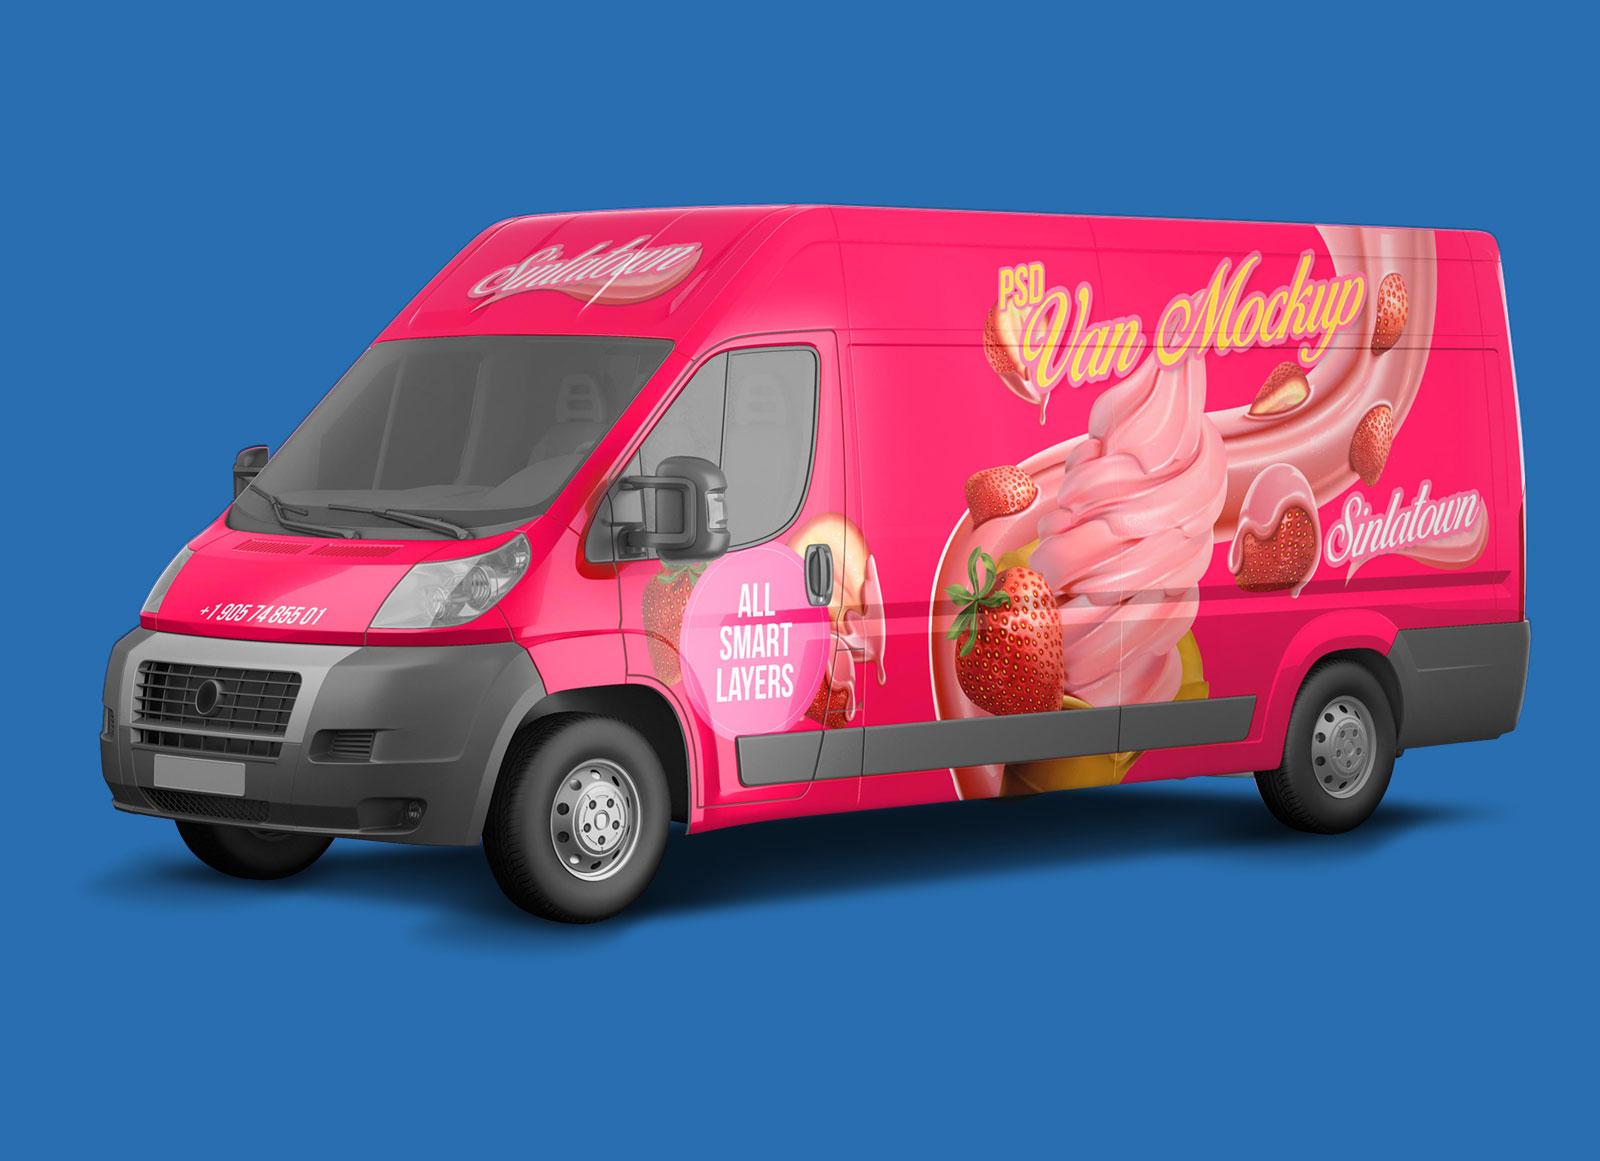 Free-Transporter-Delivery-Panel-Van-Mockup-PSD